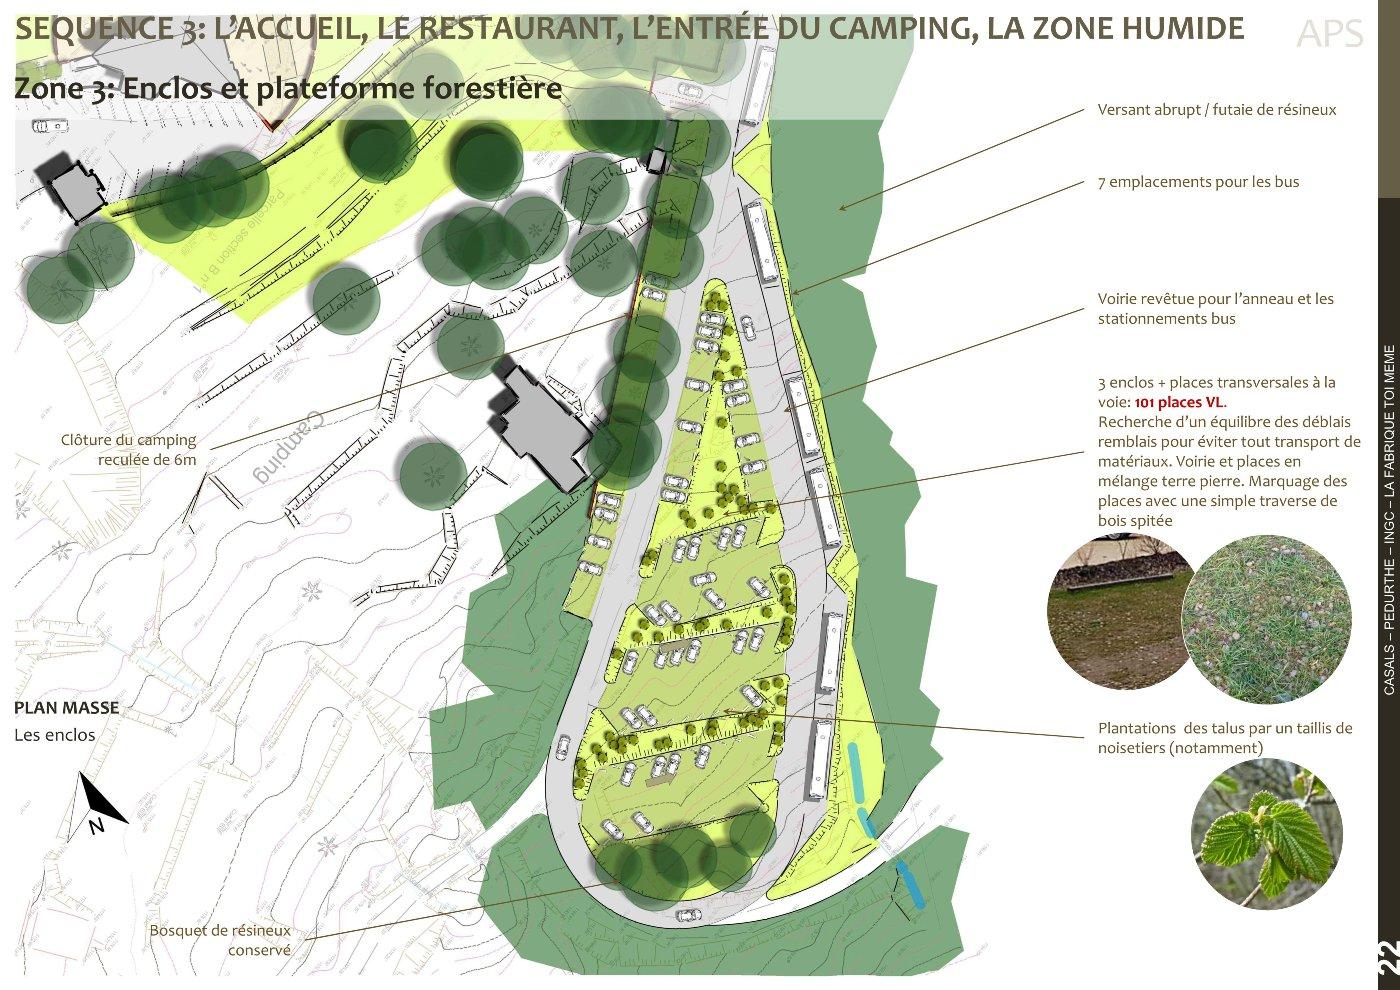 AVP, plan masse zone 3